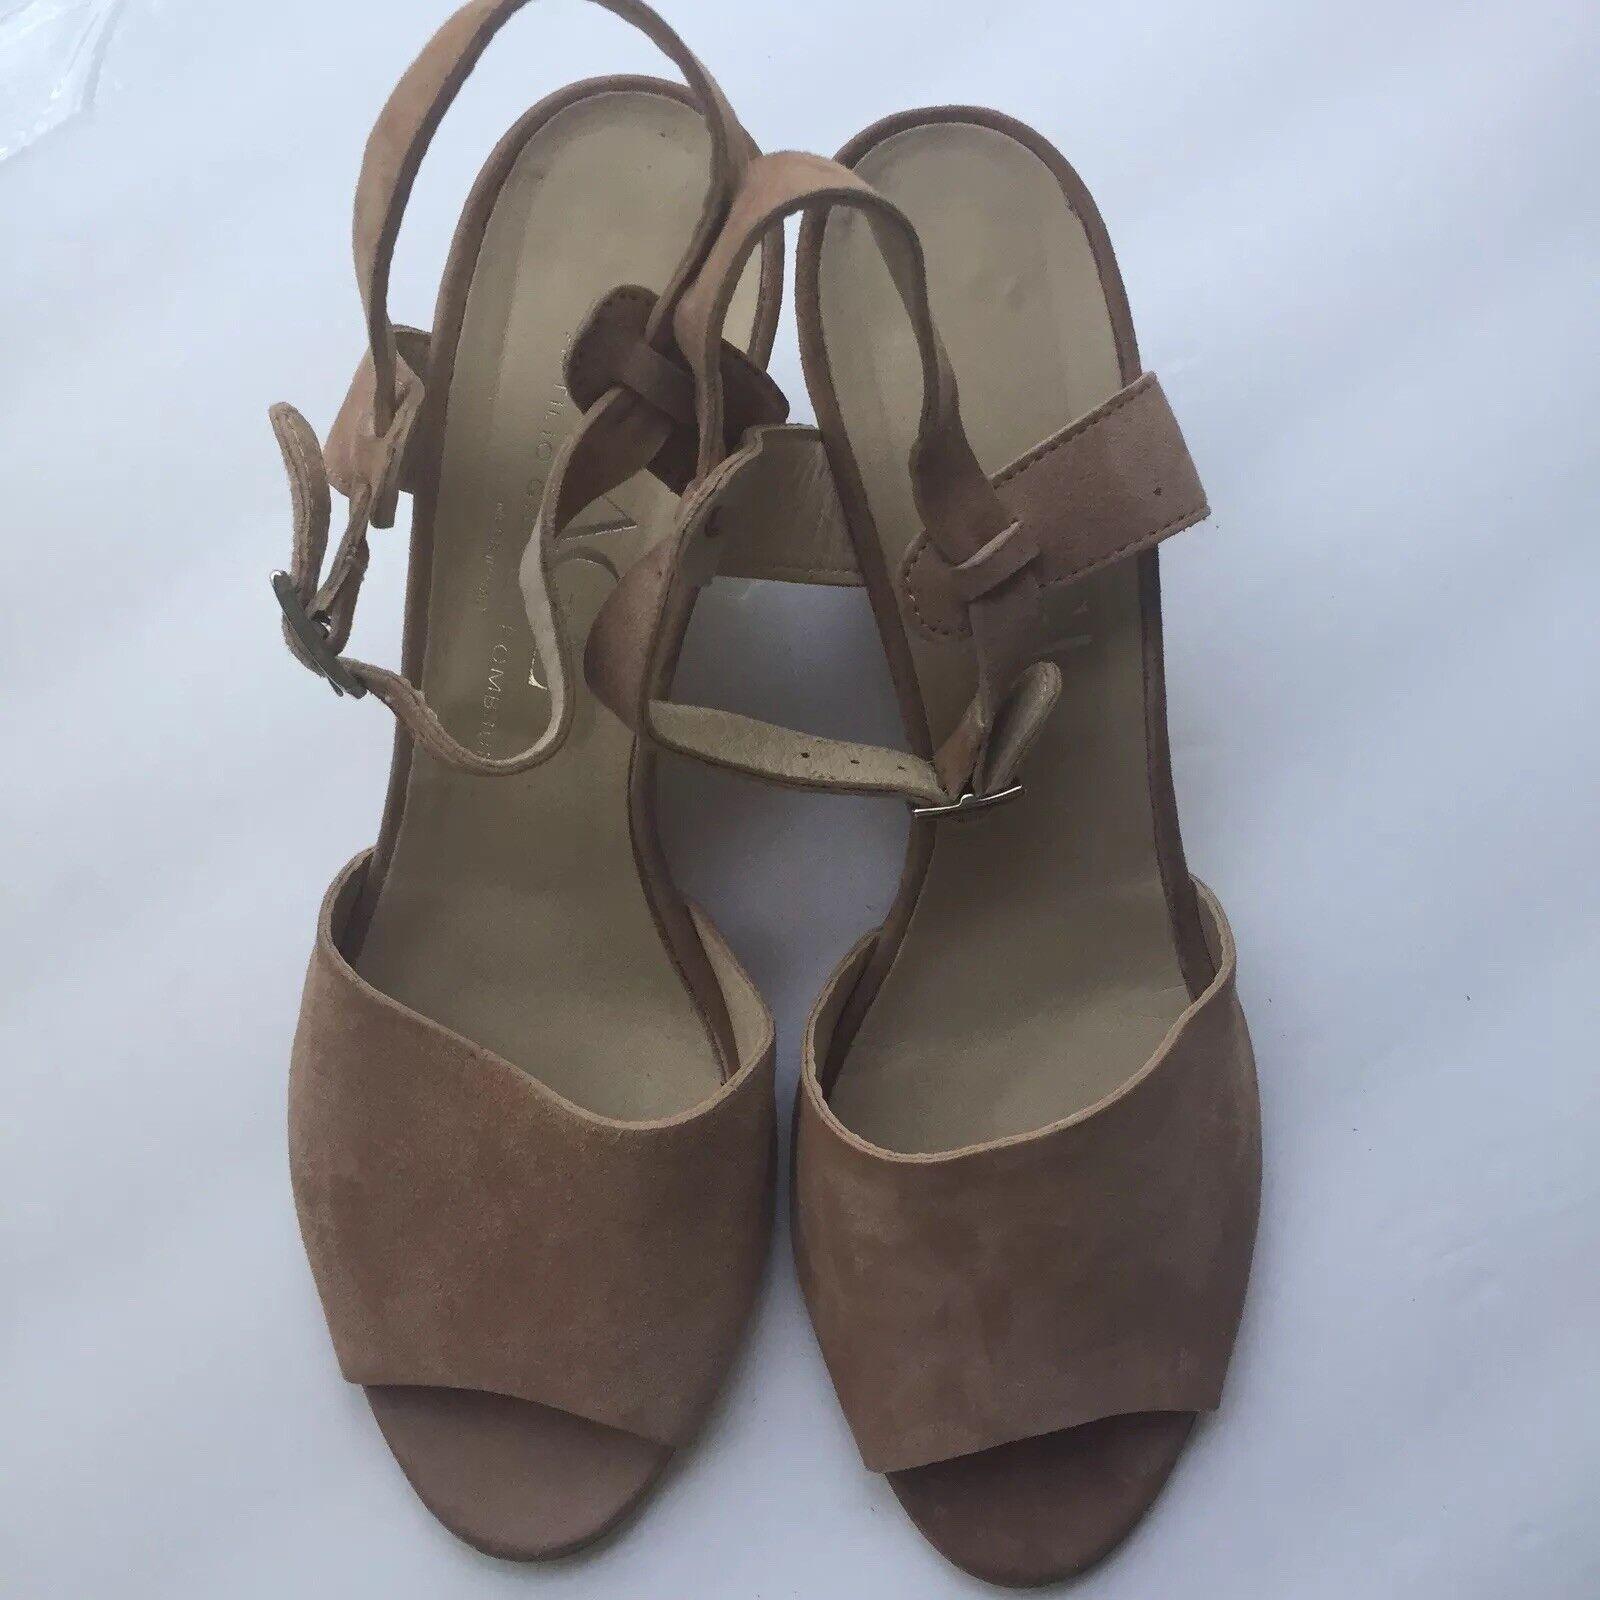 Made in  AGL Alyssa Wedge Sandal Women's Sz 40EU  10US